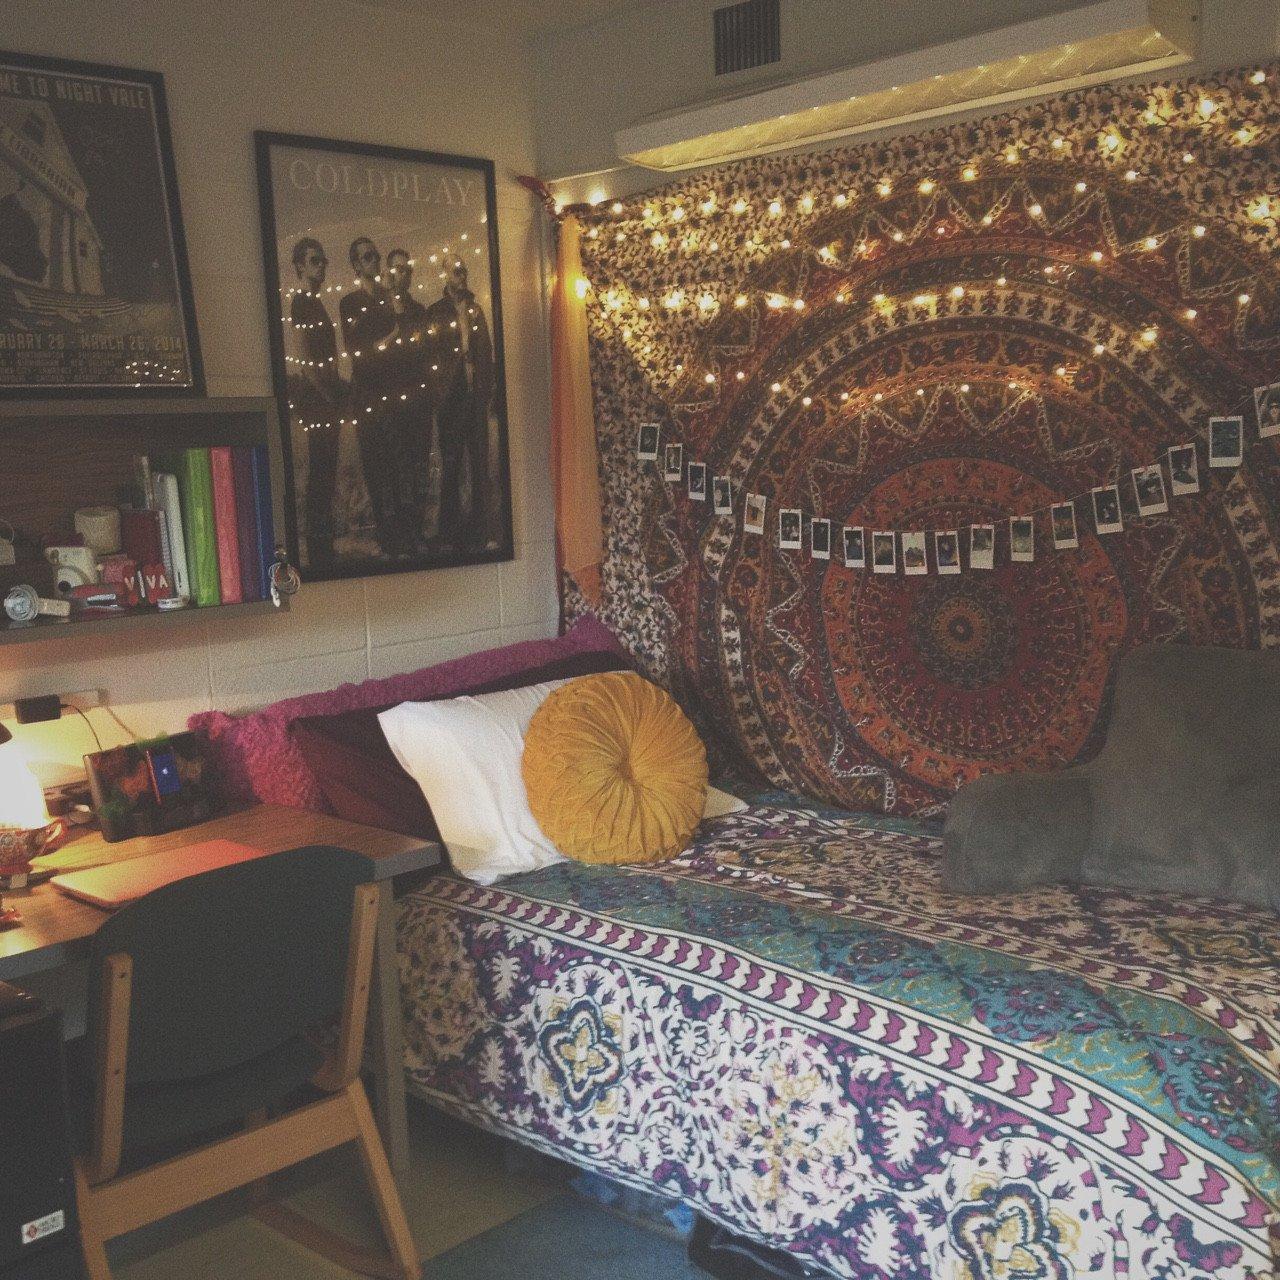 Dorm Room Wall Decor Ideas Fresh Dorm Decorating Ideas by Style – society19